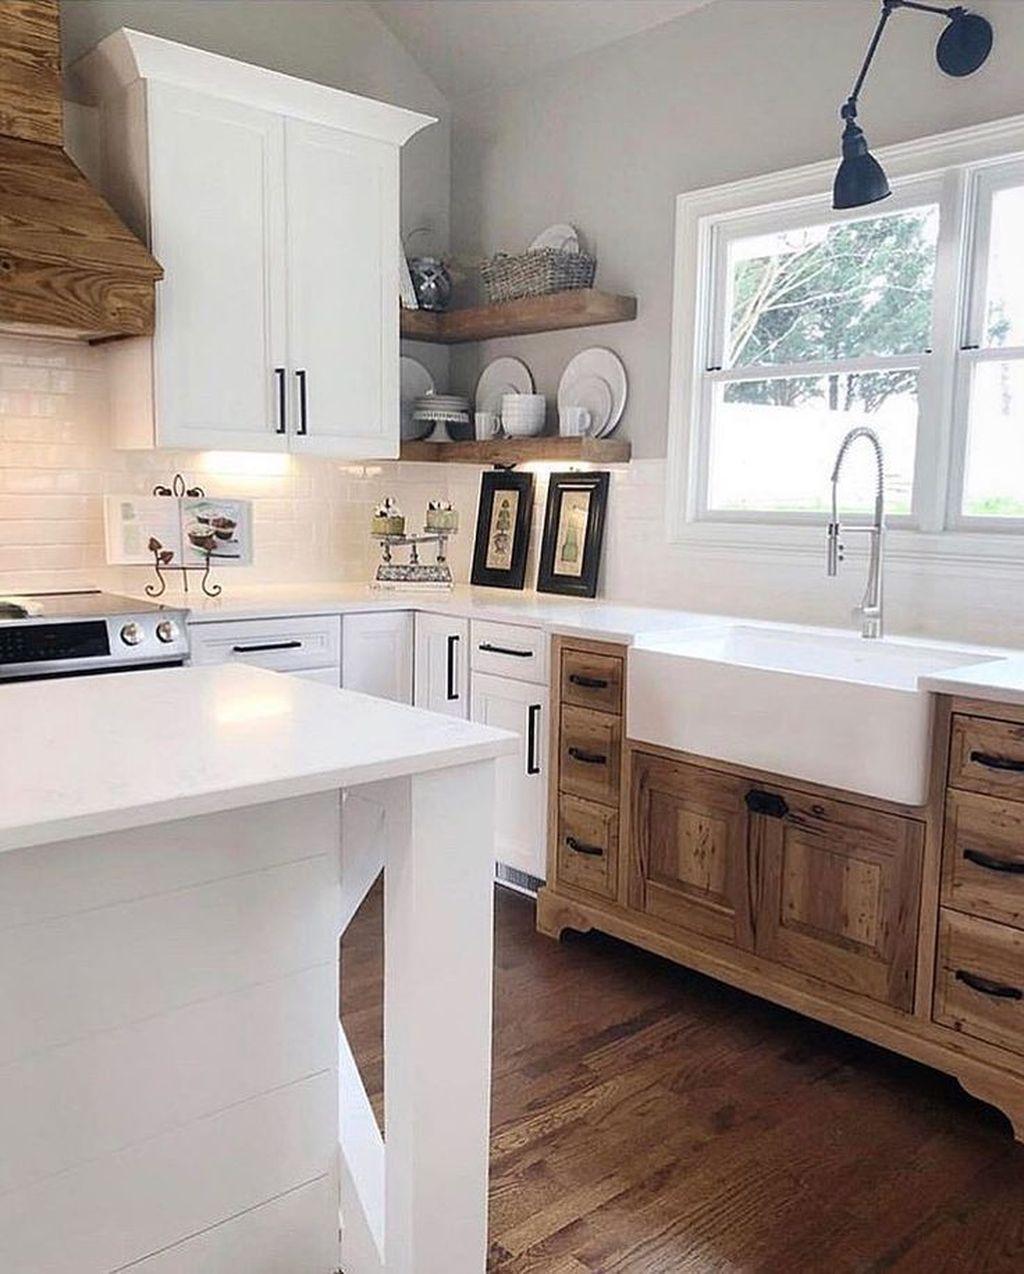 35 Kitchen Ideas Decor And Decorating Ideas For Kitchen: 51 Favorite Farmhouse Kitchen Design Ideas